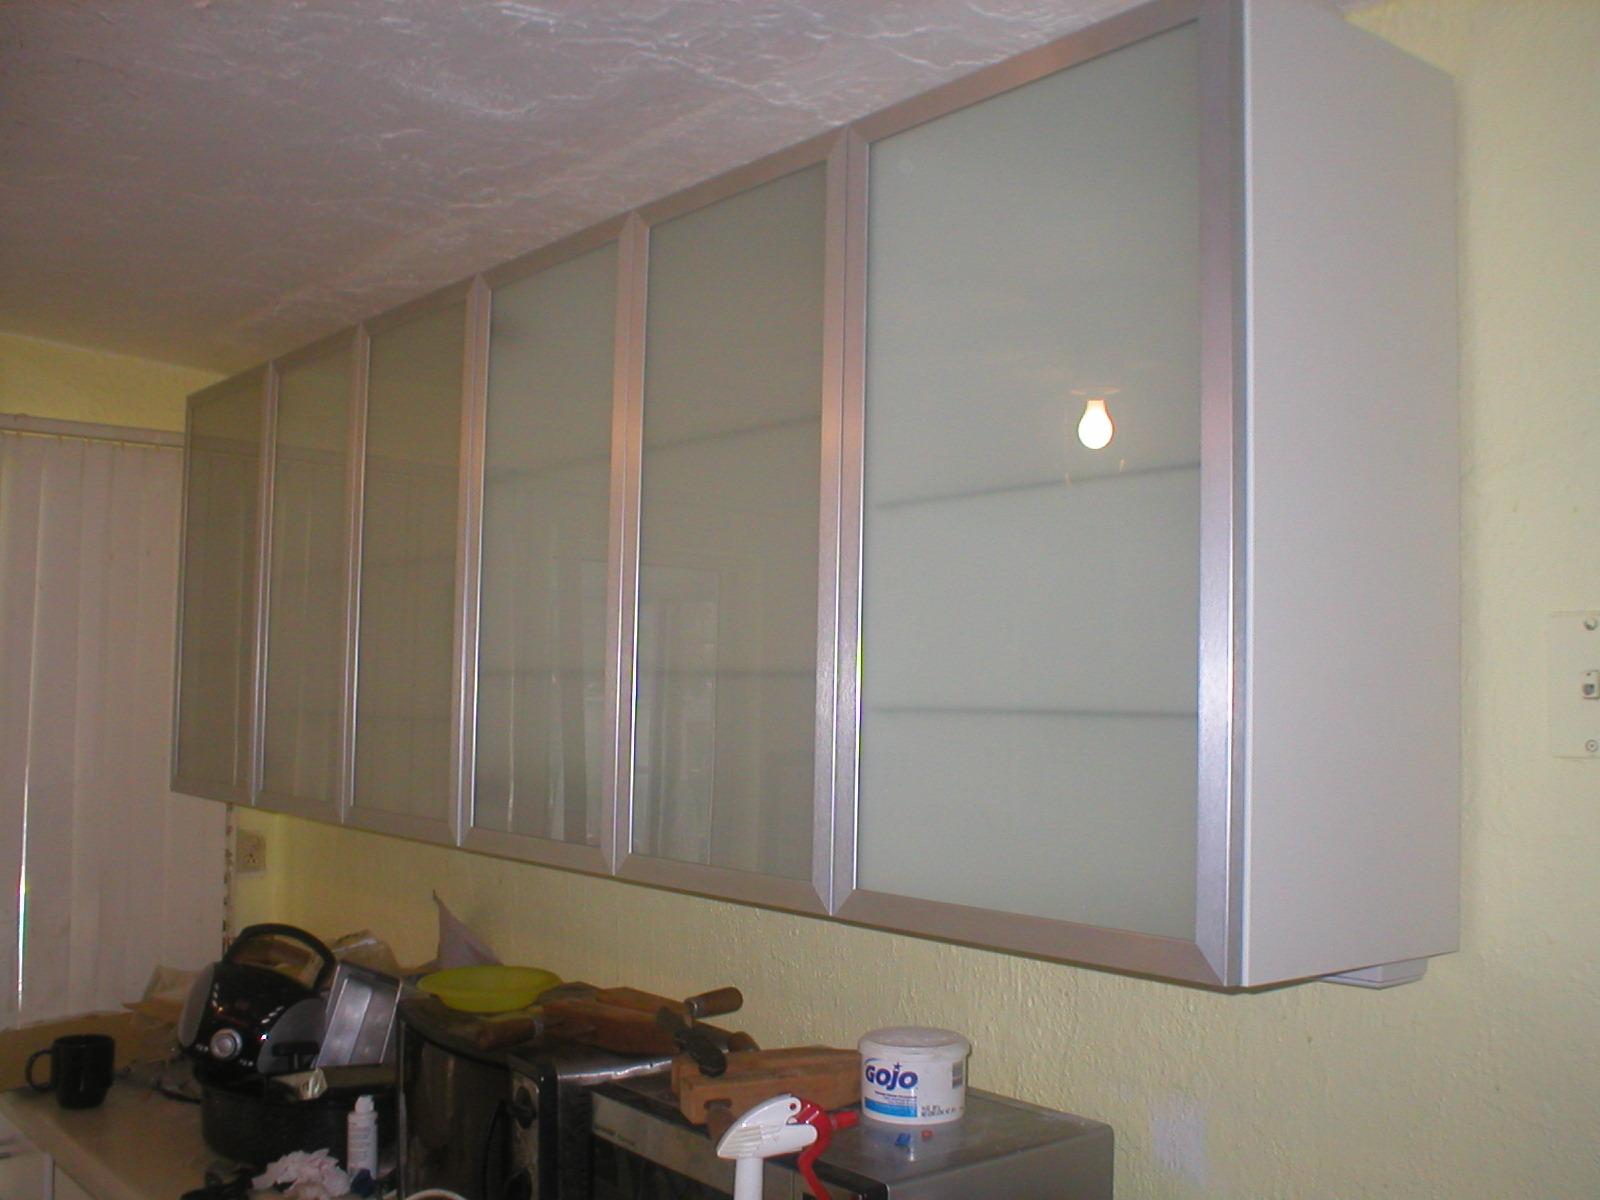 Installing Ikea Upper Kitchen Cabinets 5 Steps